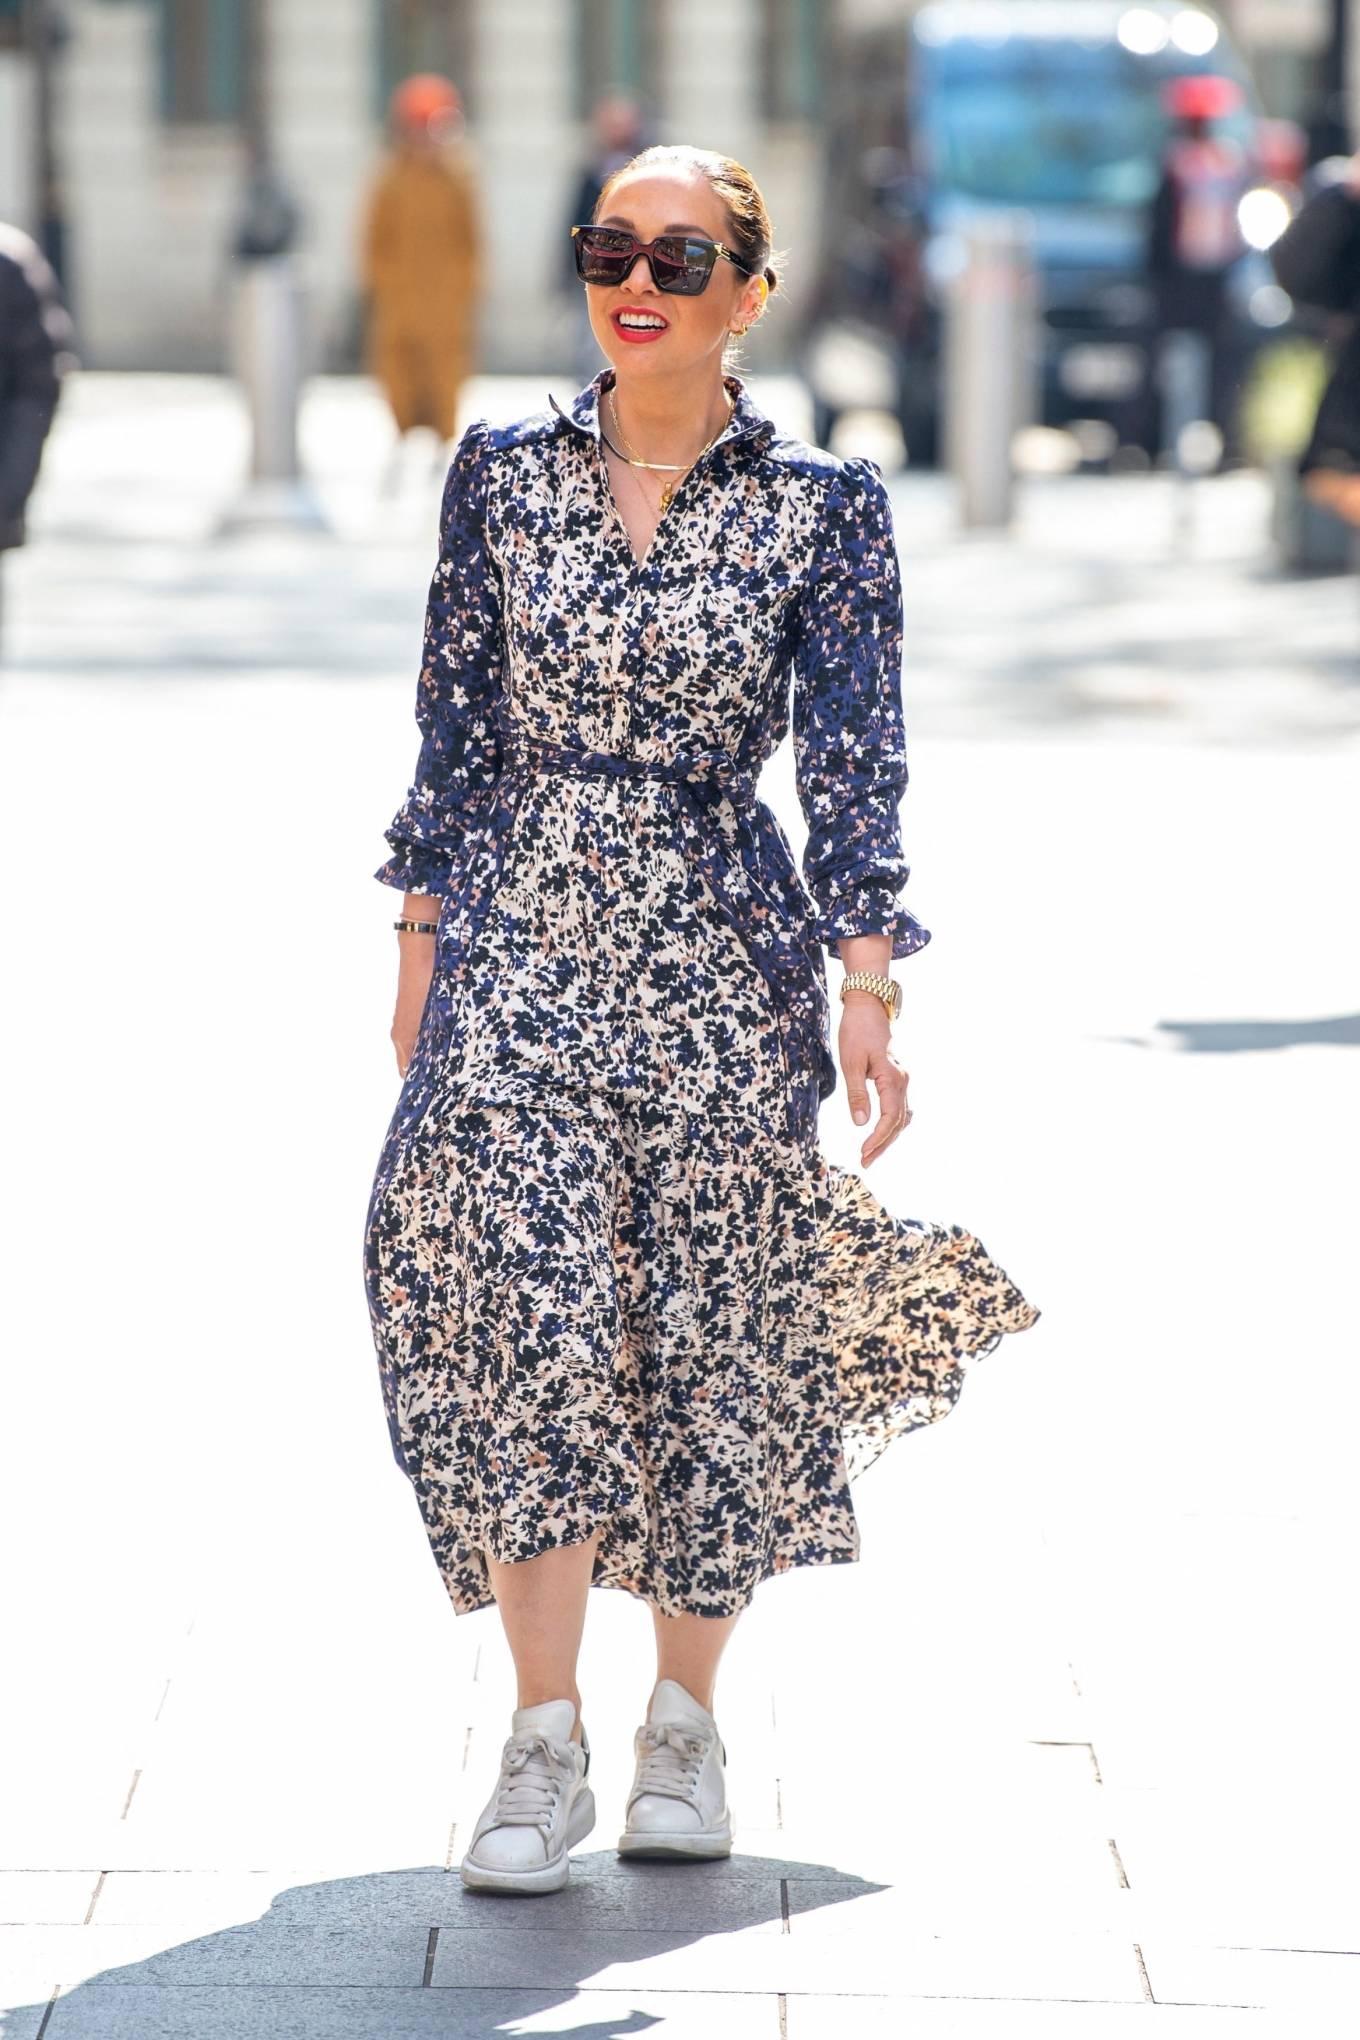 Myleene Klass 2021 : Myleene Klass – In a long summer dress arriving at the Global studios -08